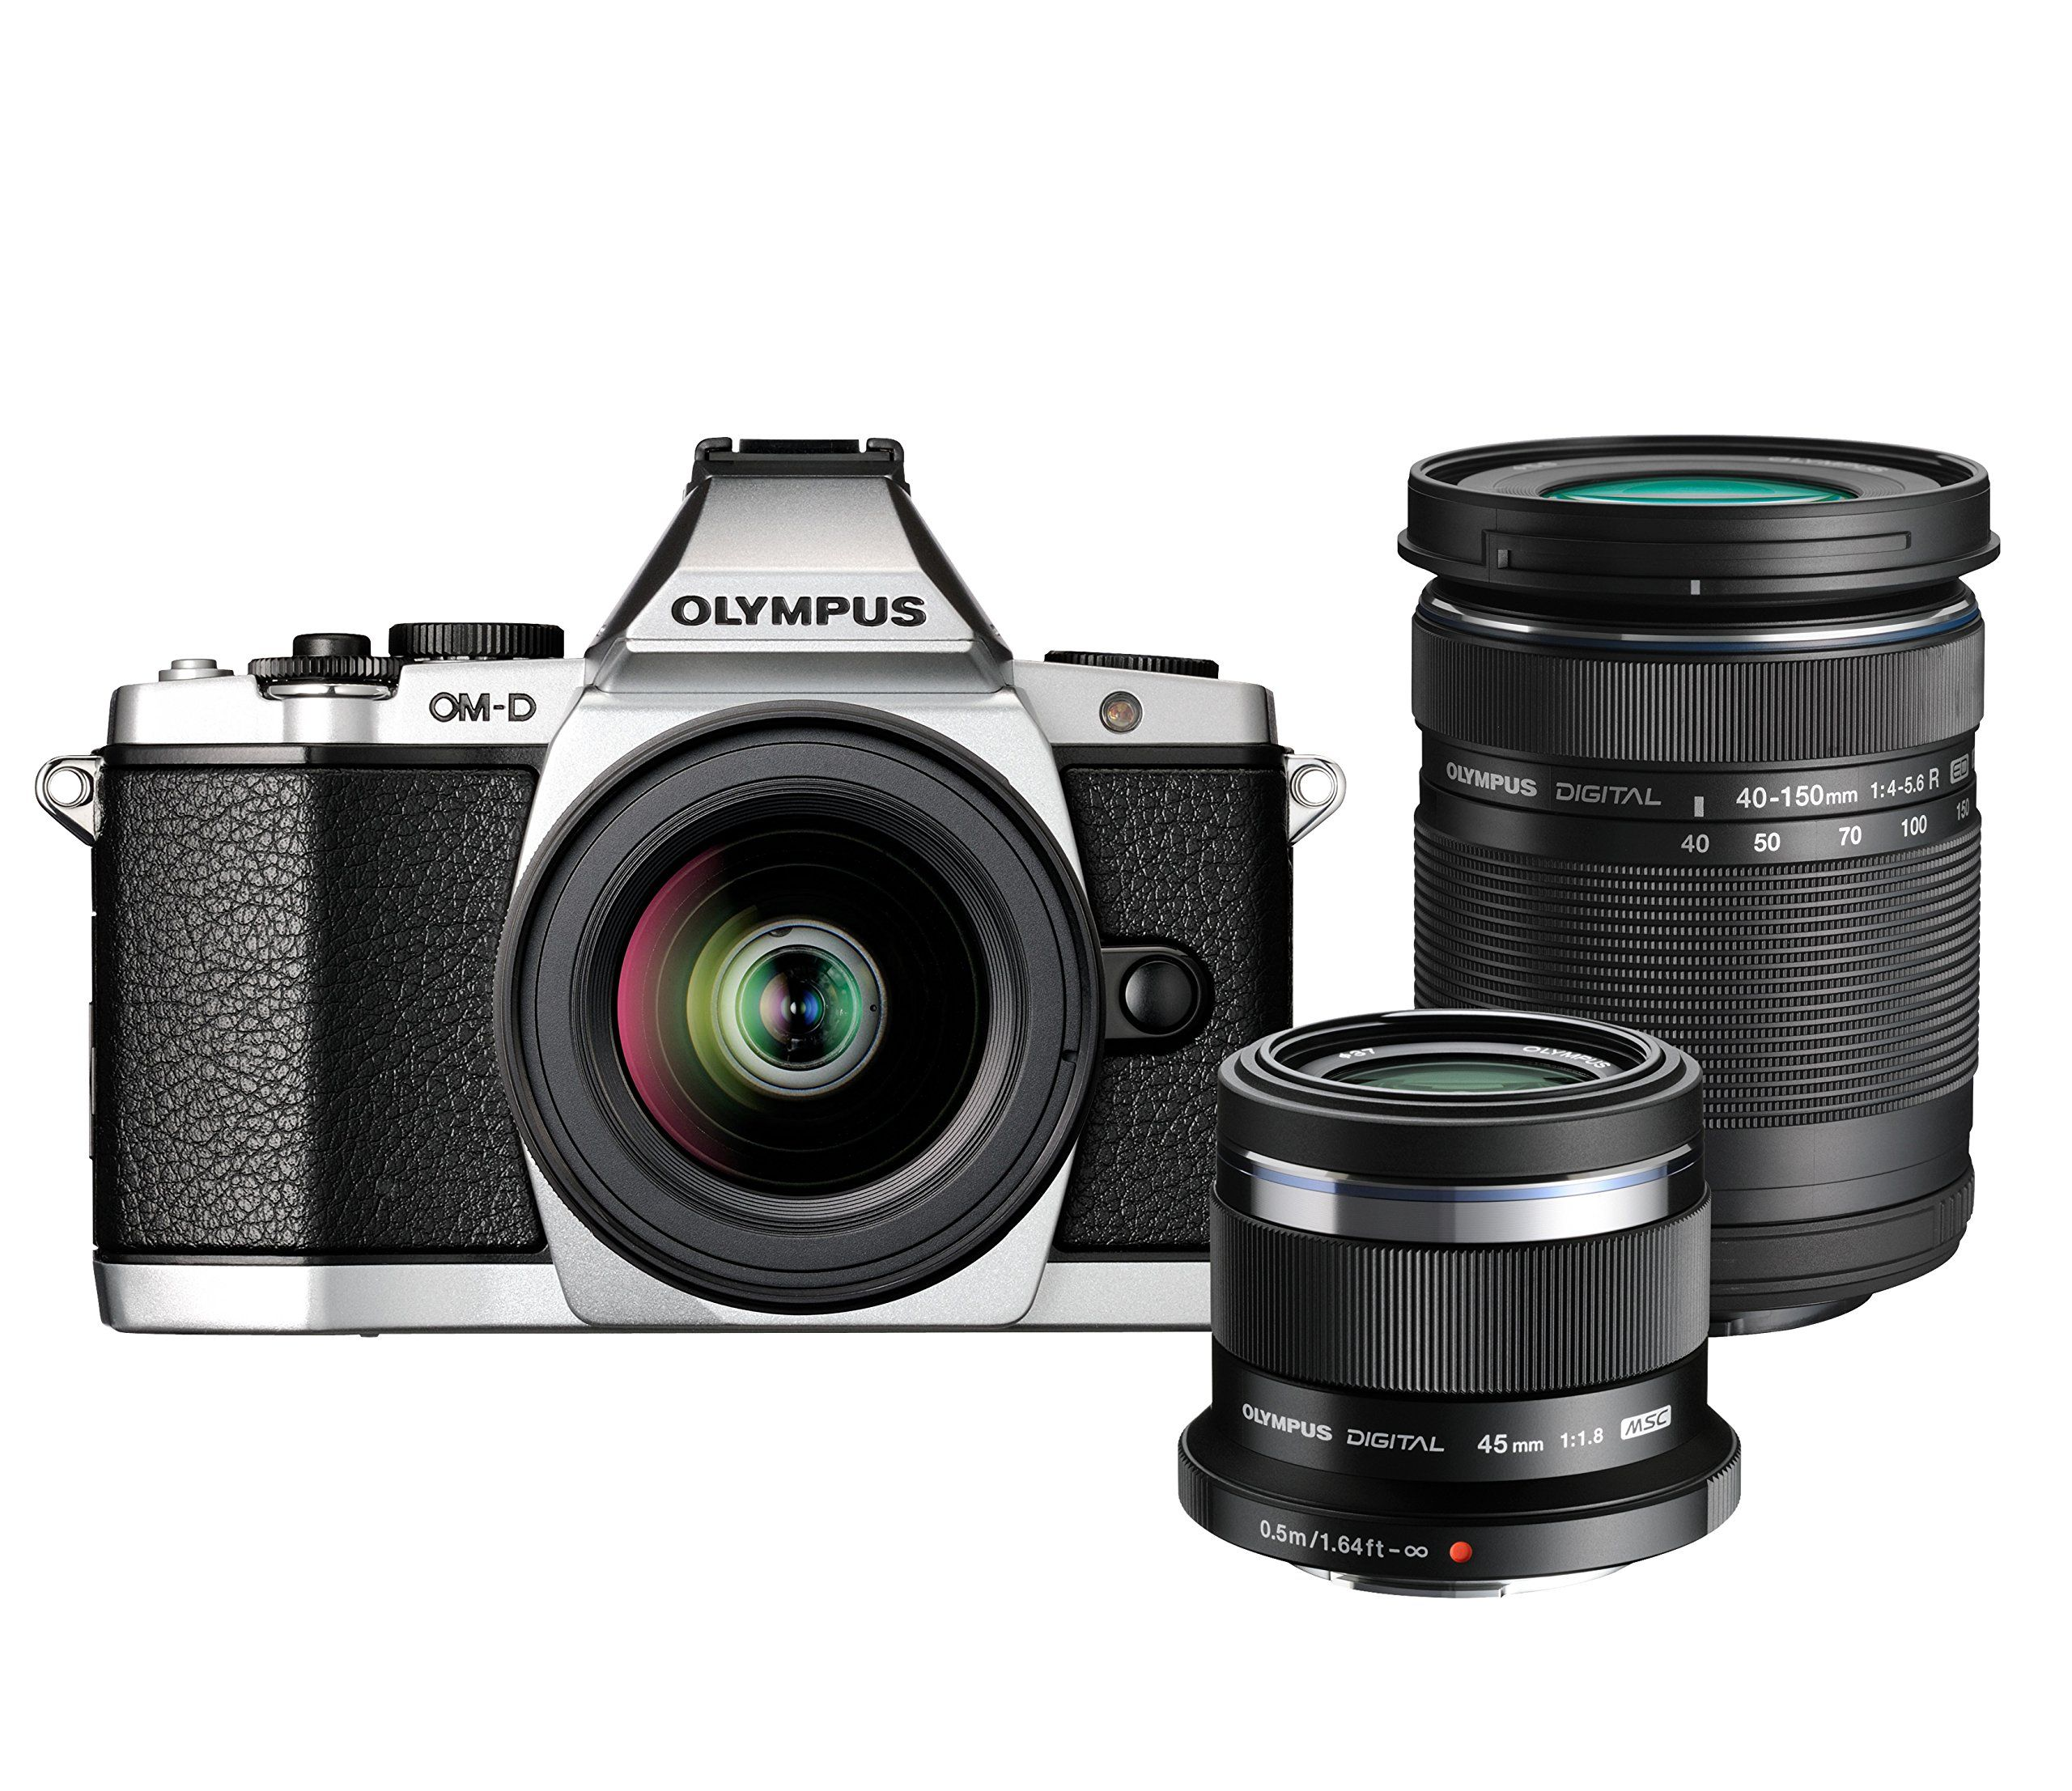 Olympus OM-D E-M5 Travel Kit with M.Zuiko Digital ED 12-50mm, 40 ...